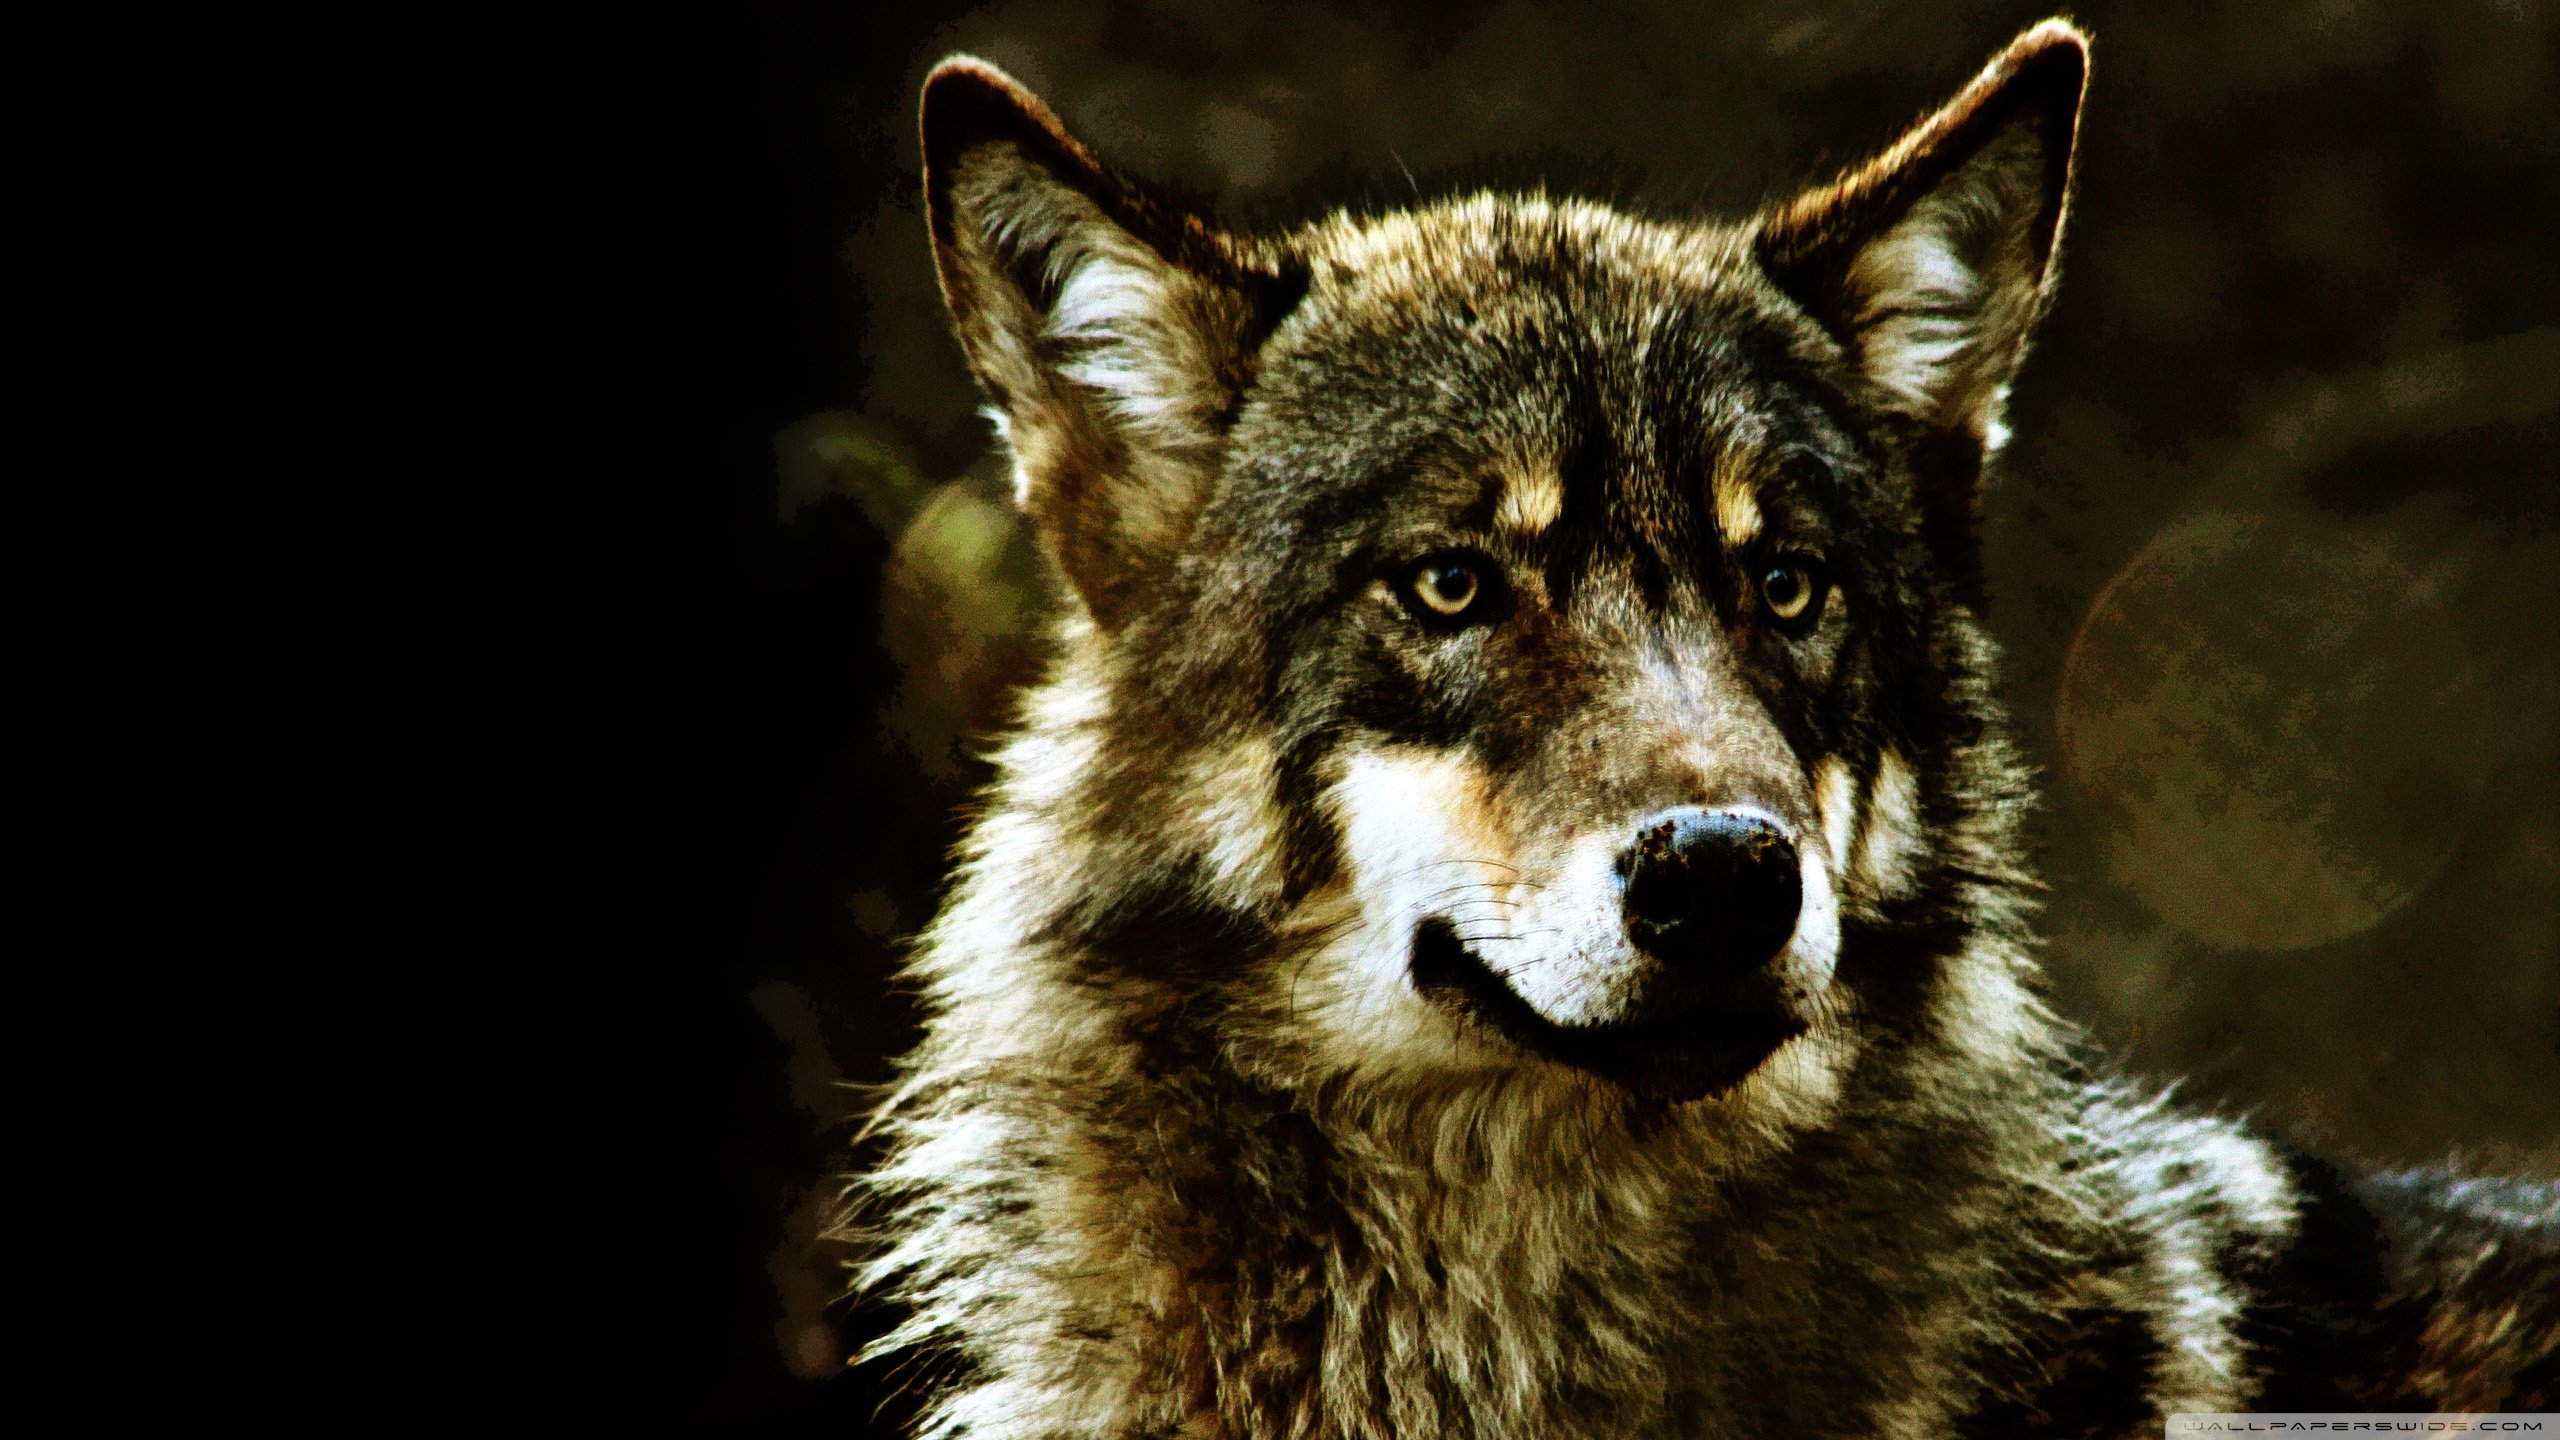 Wolf Wallpapers 2560x1440 Desktop Backgrounds